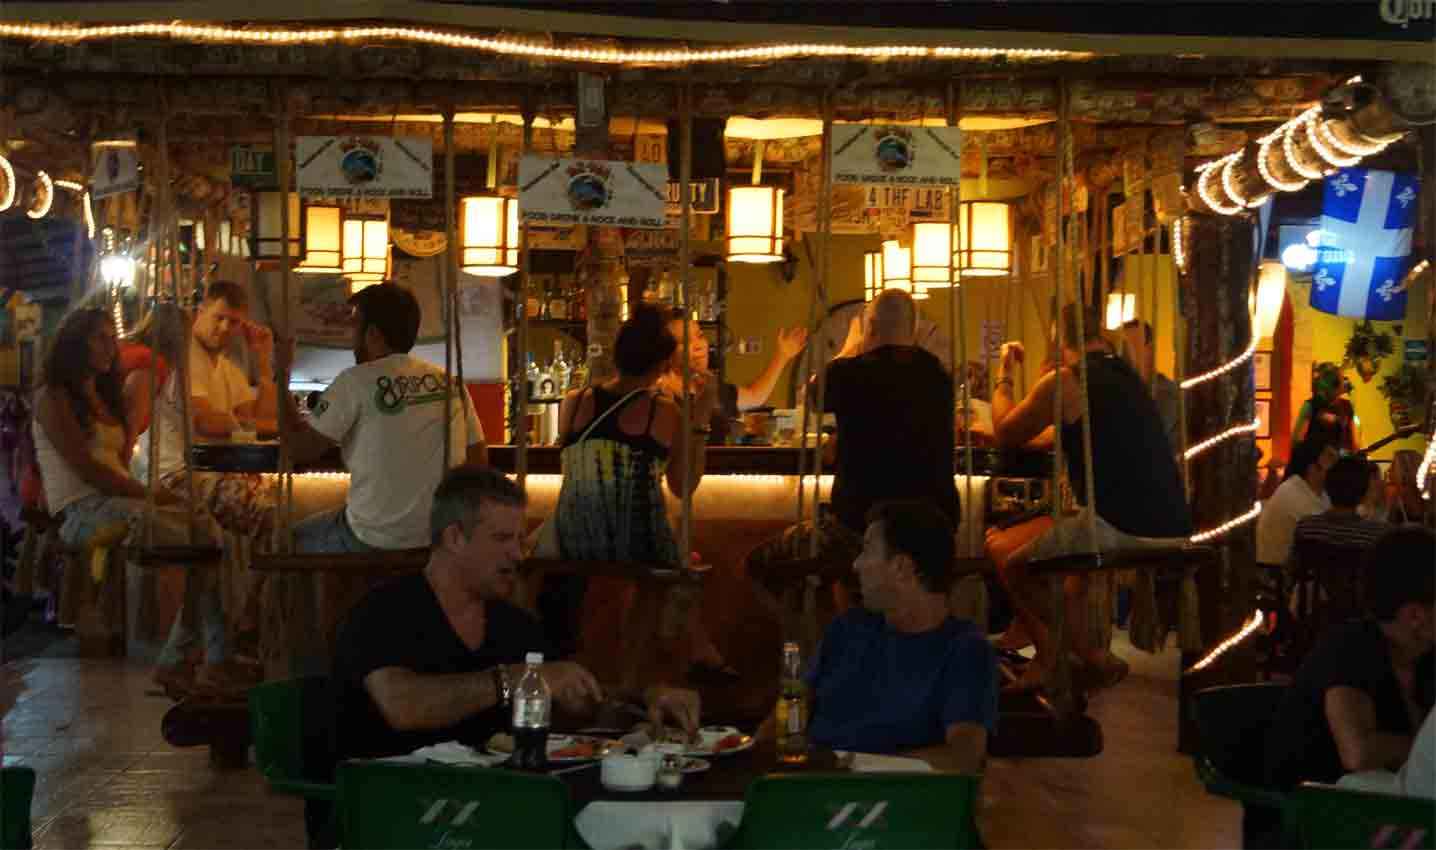 A popular bar with swings for seats in Playa Del Carmen.